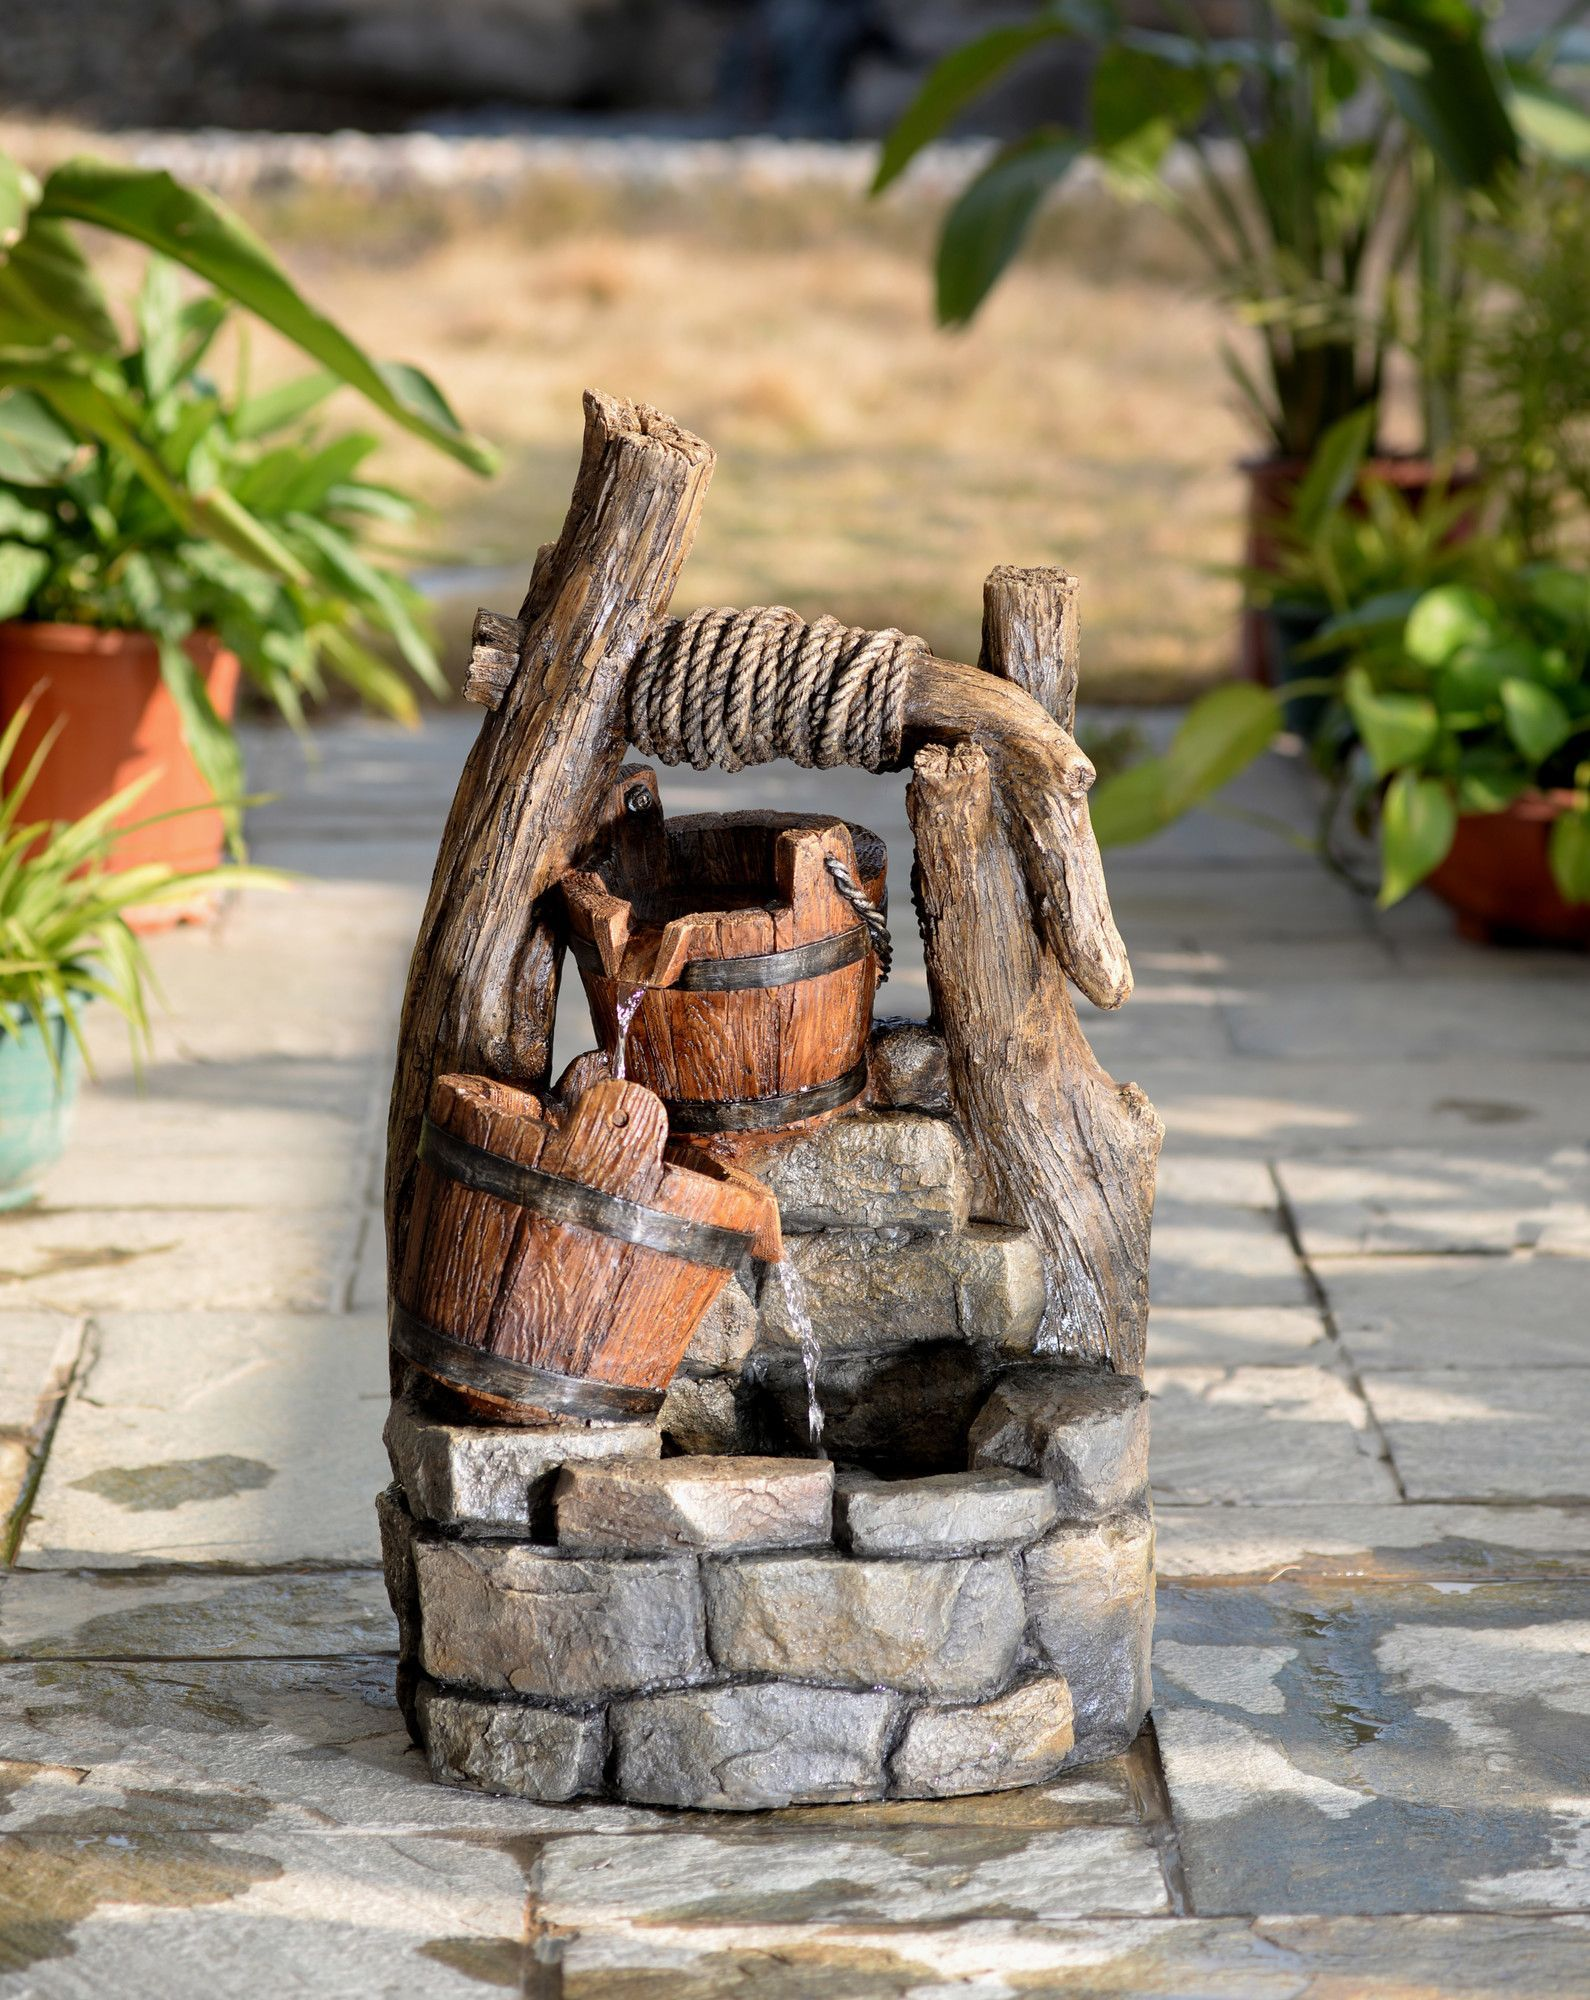 Resin Fiberglass Tree Trunk And Pots Water Fountain